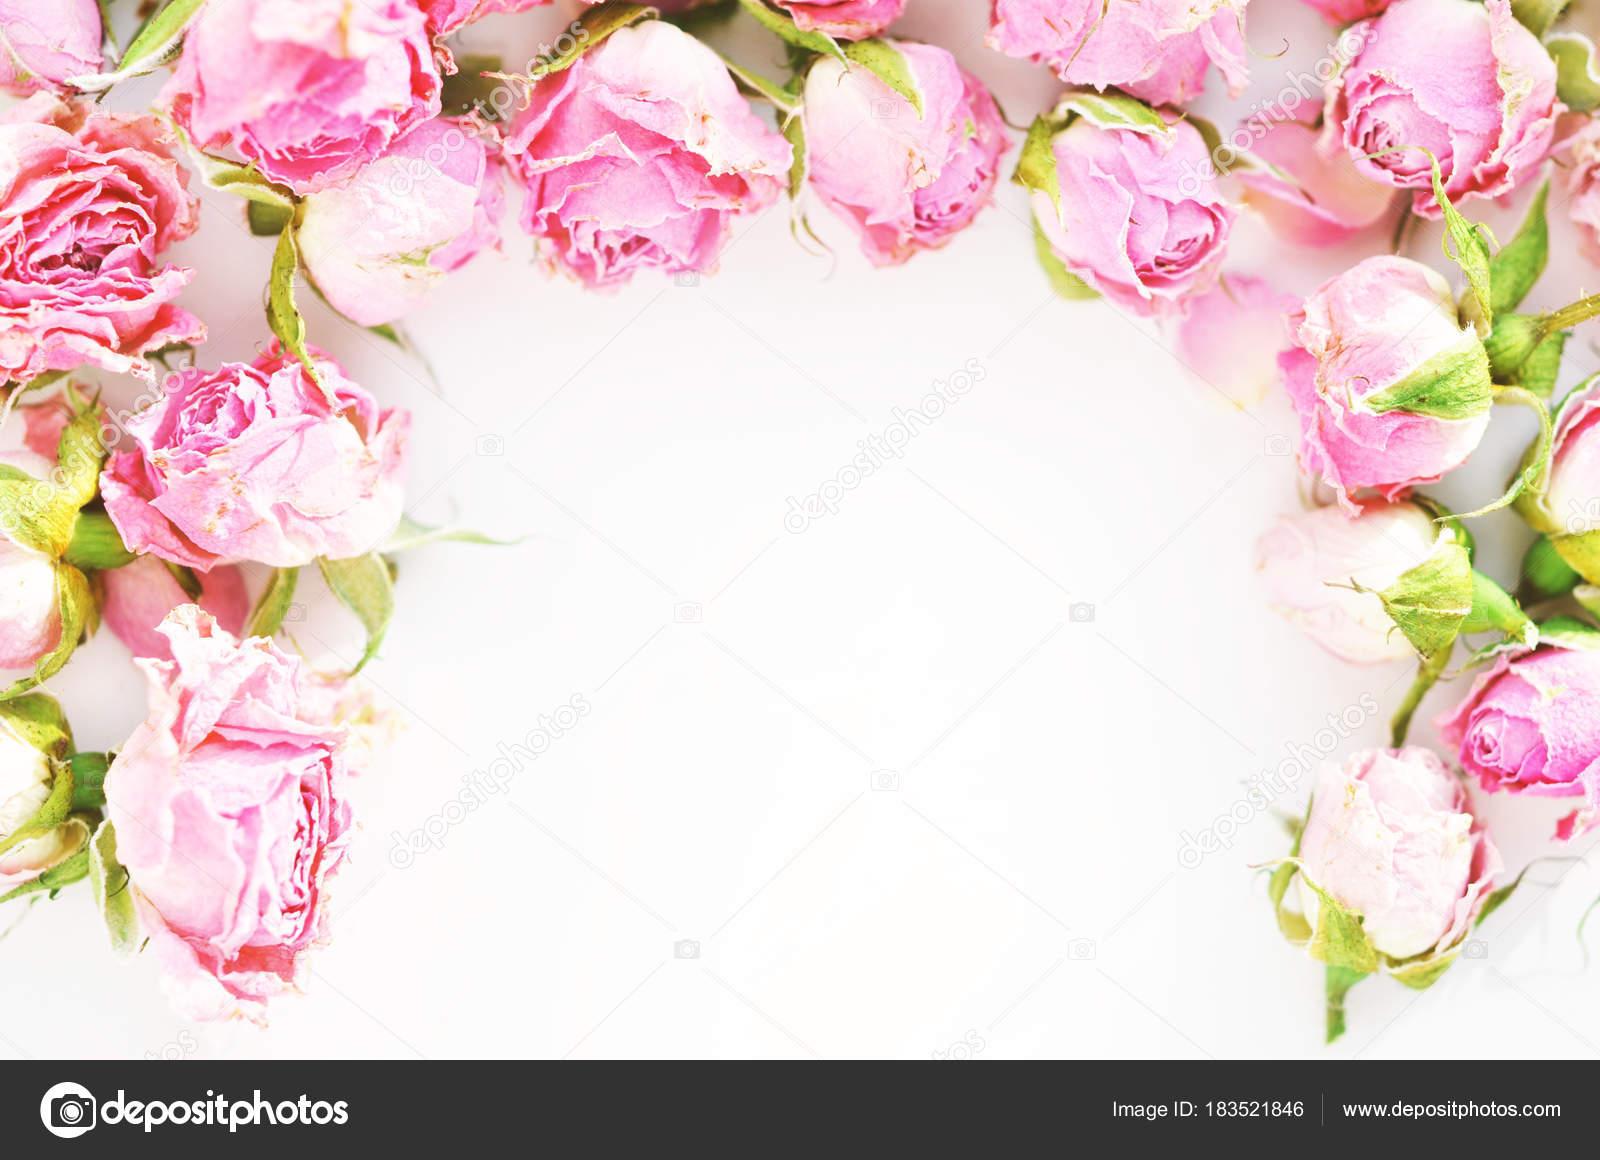 Fondo Marco Flores Png Composicion Flores Marco Flores Secas Rosa